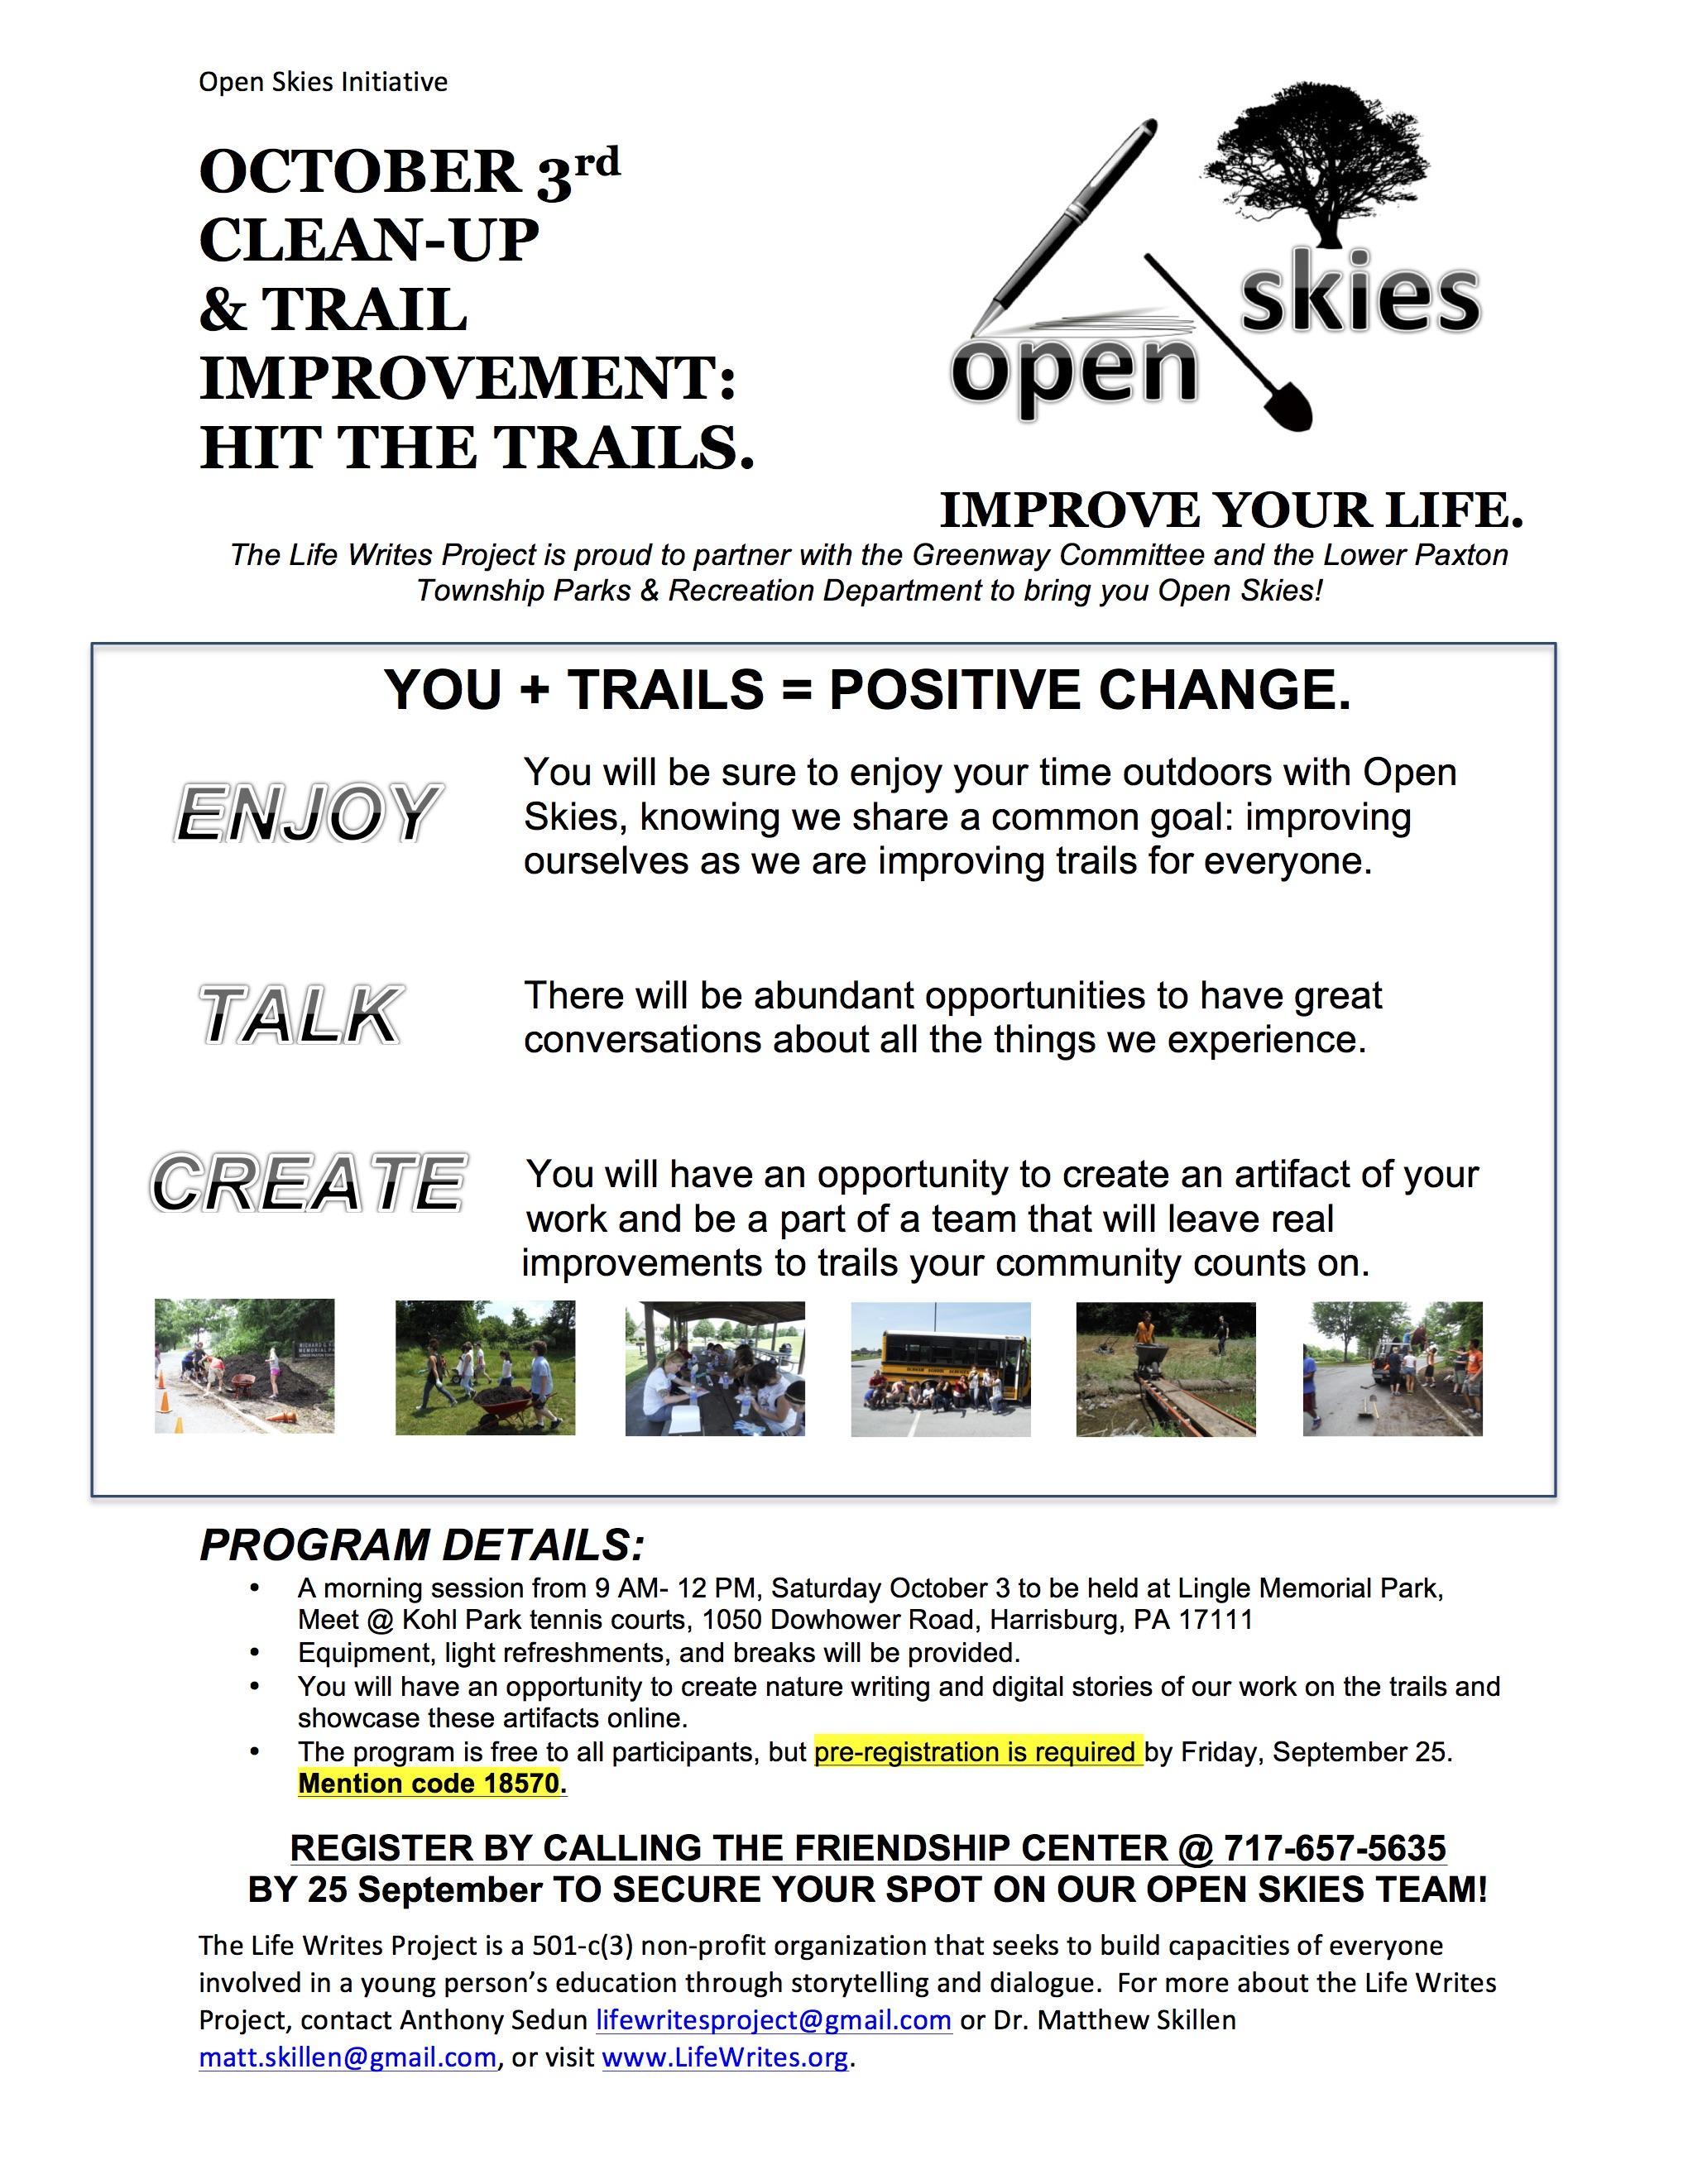 LWP 2015 Open Skies flyer for 10-3 participants.jpg